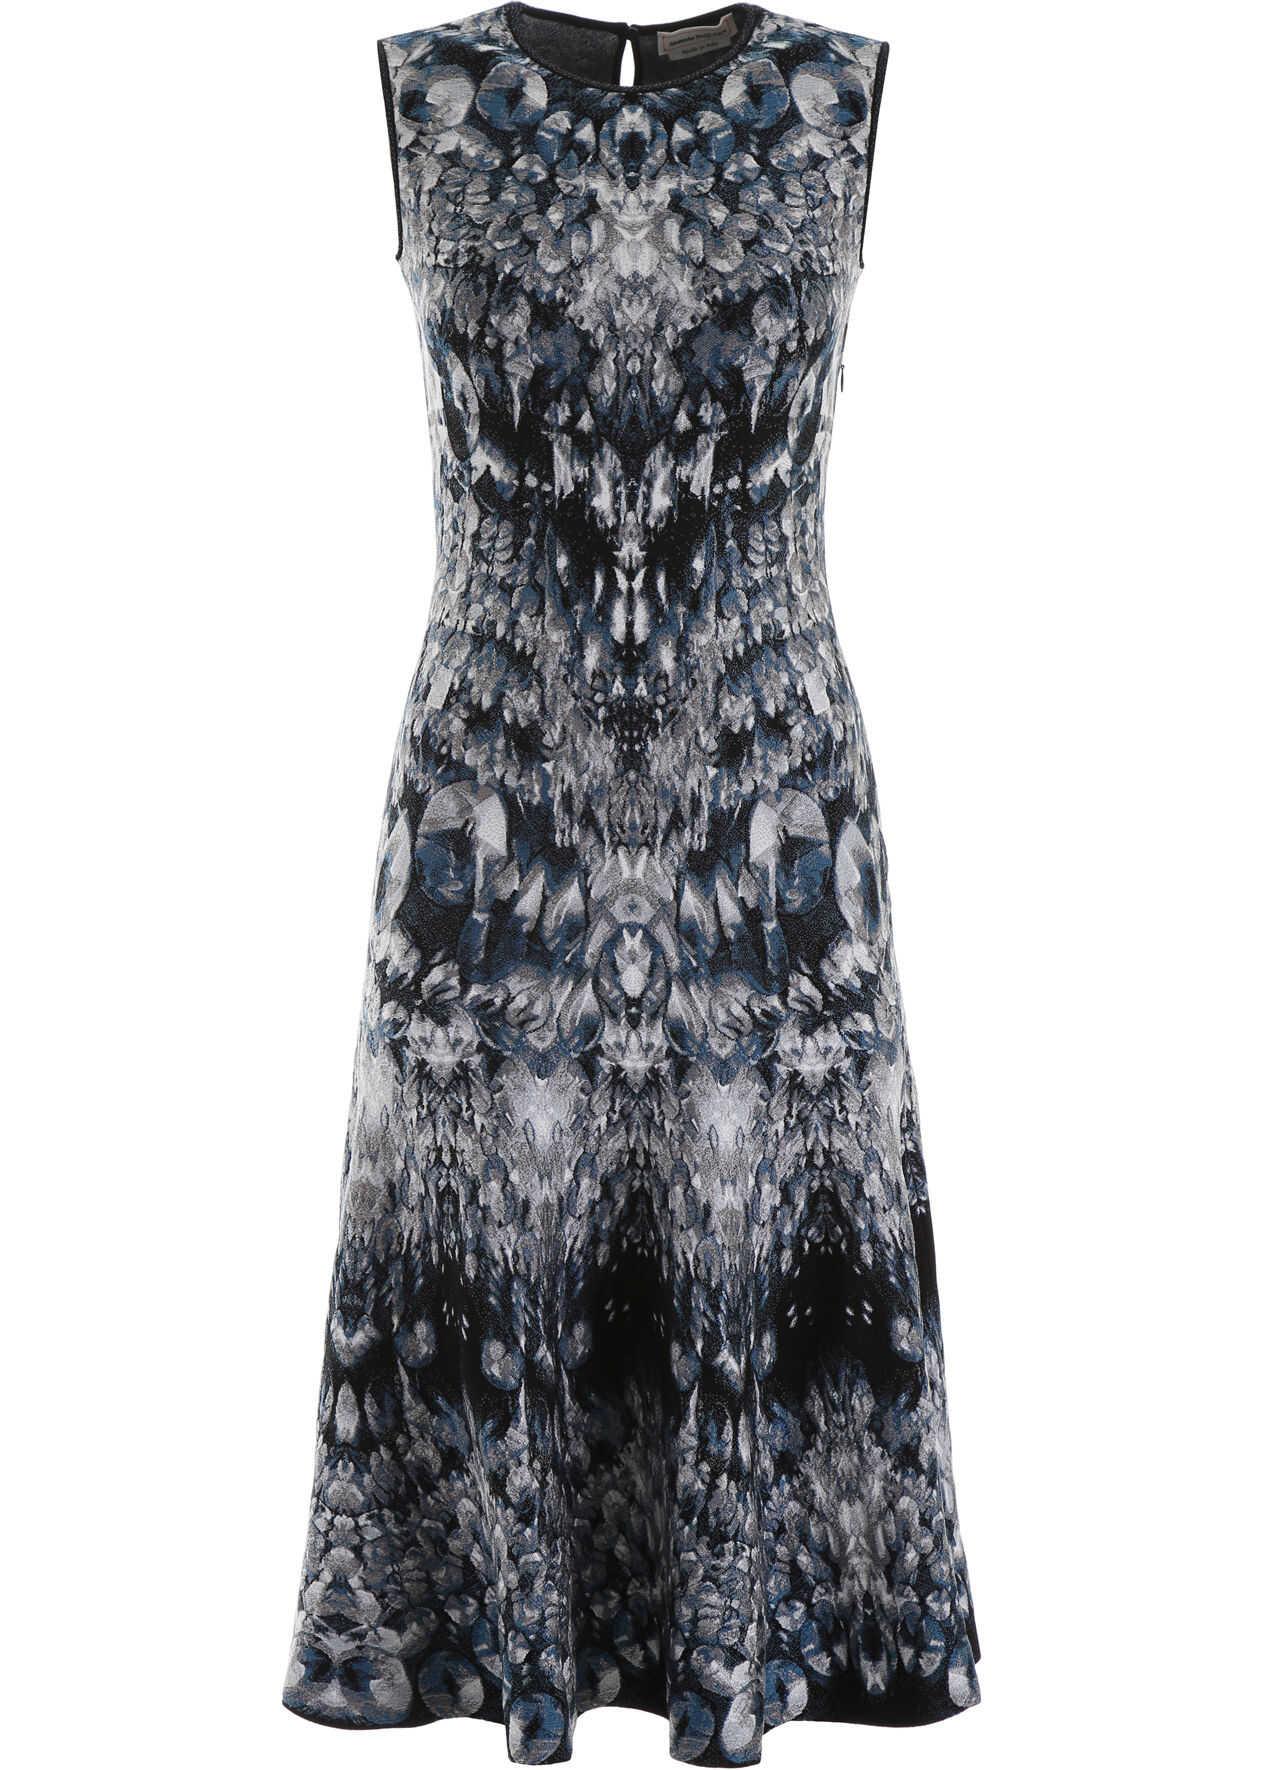 Alexander McQueen Archive Print Dress BLUE BLACK IVORY